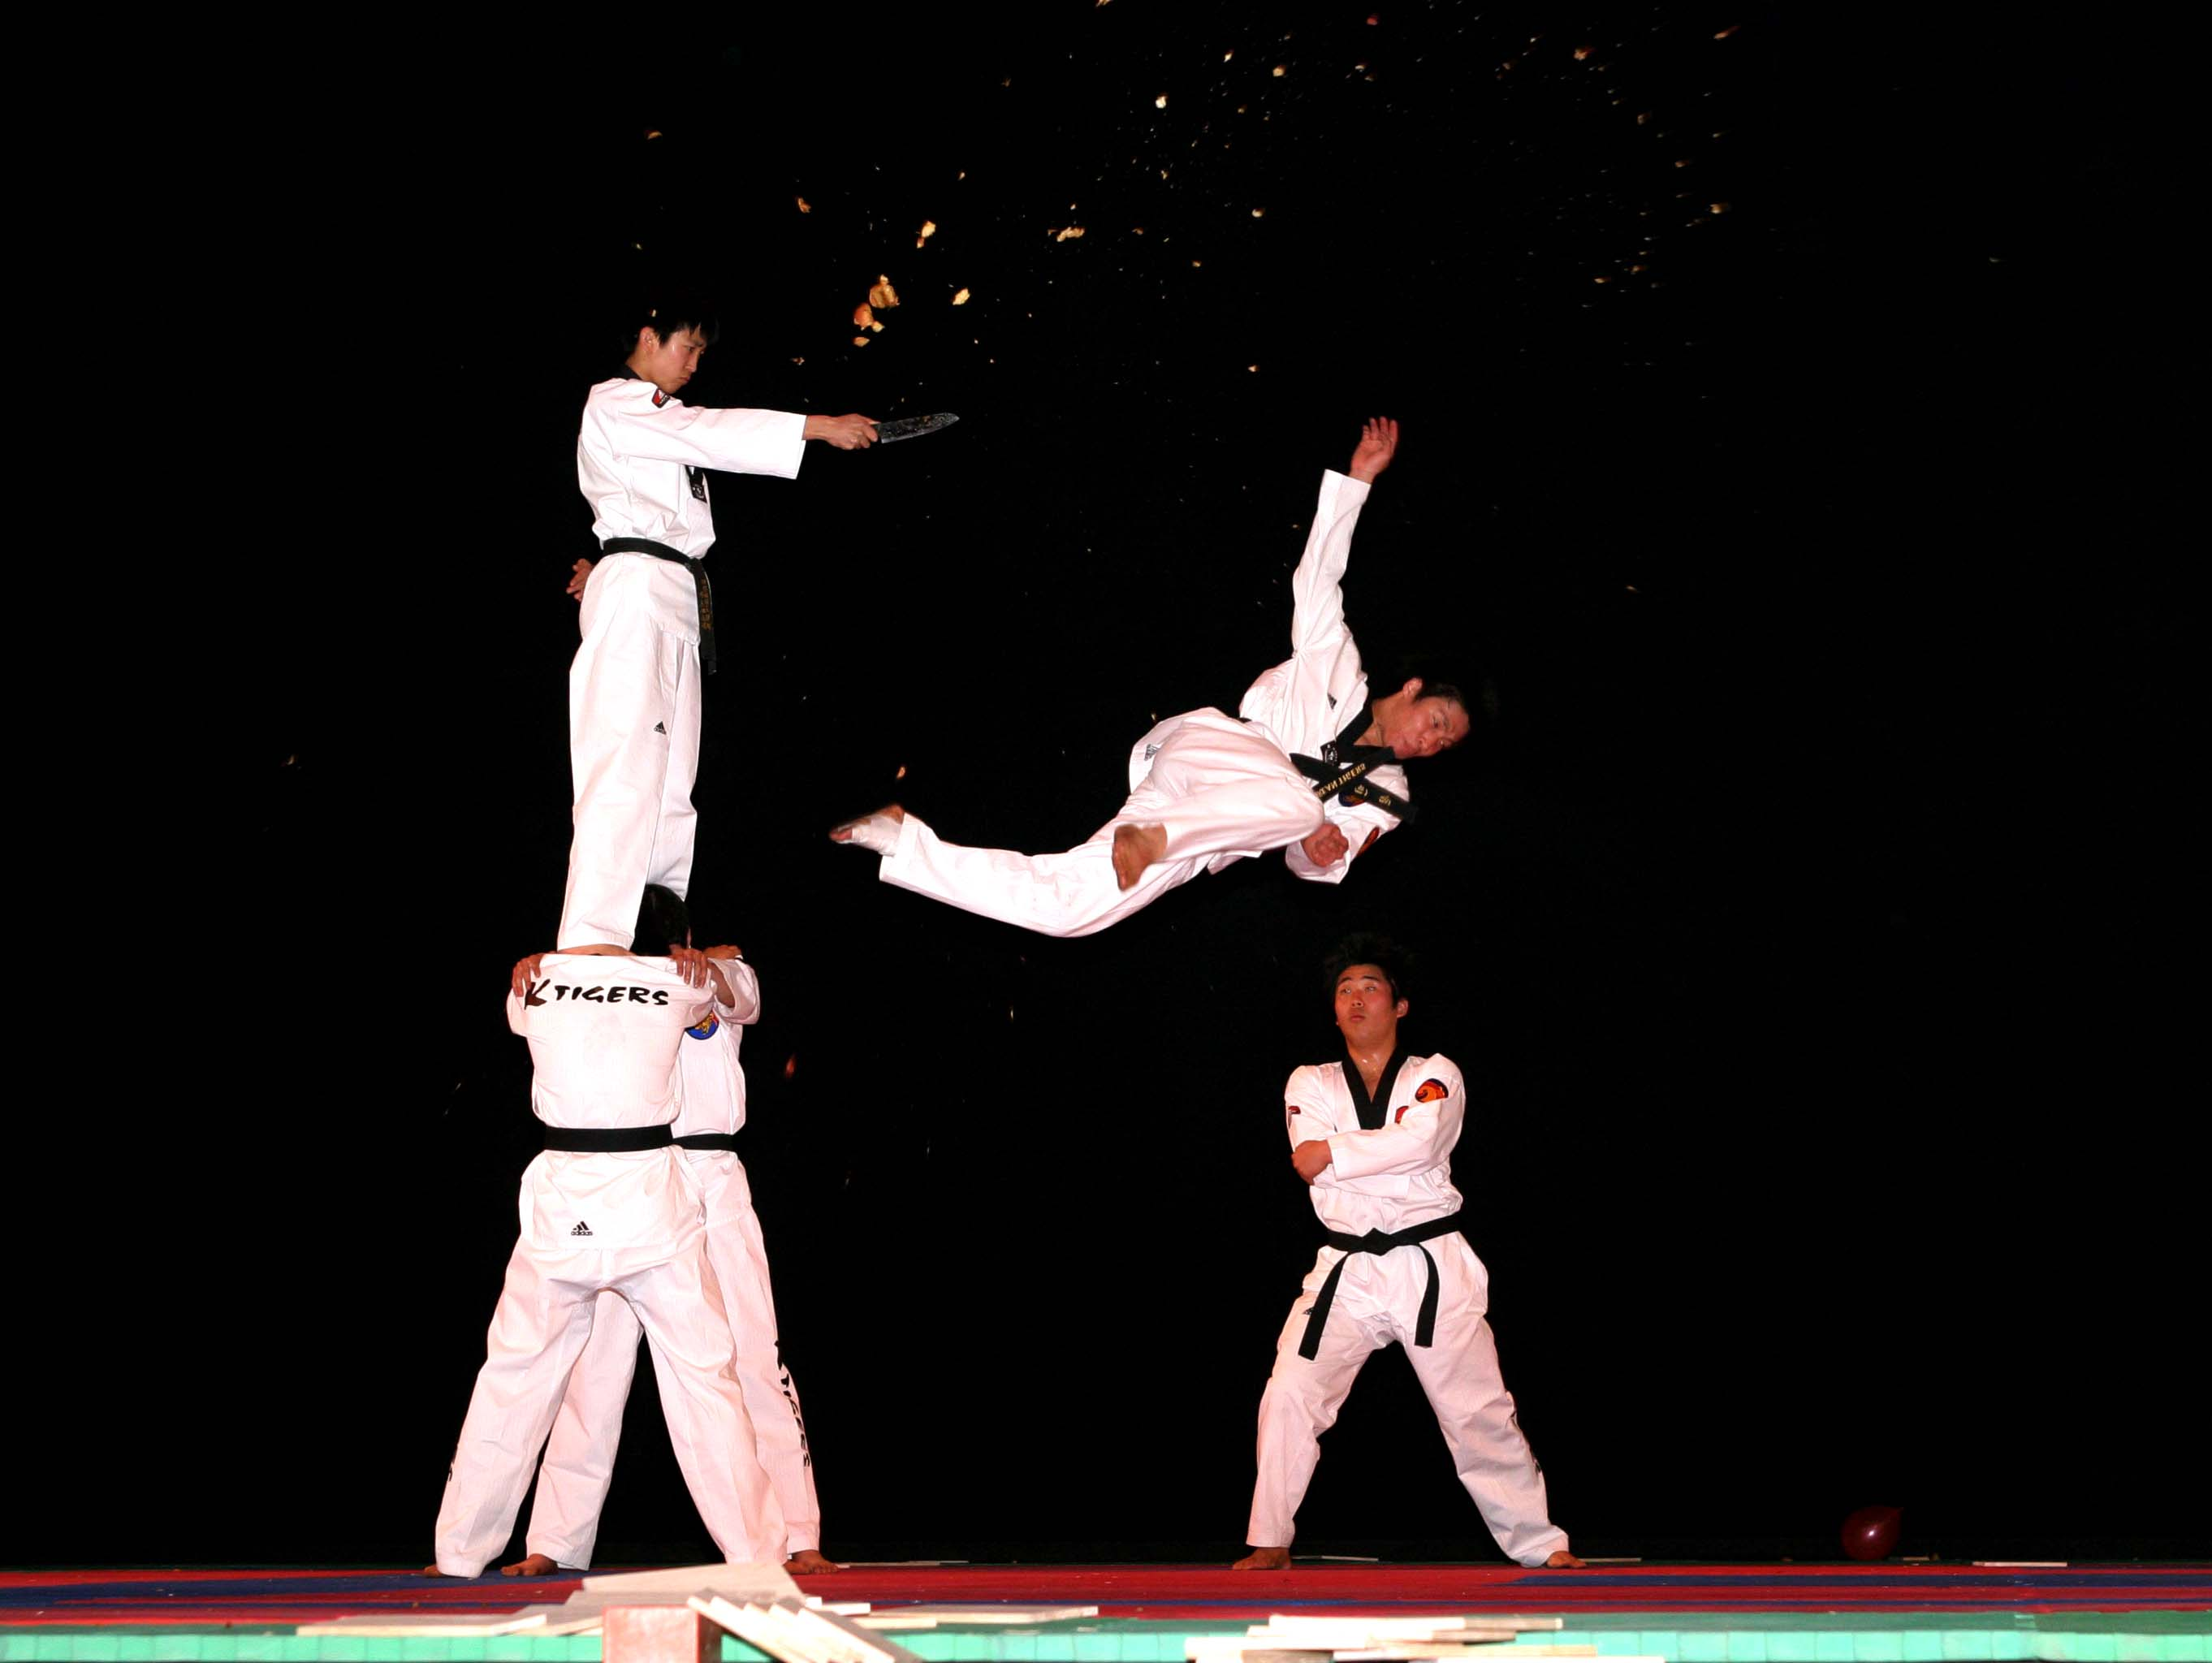 File:KOCIS Taekwondo performance by K-Tigers (6099434184 ...